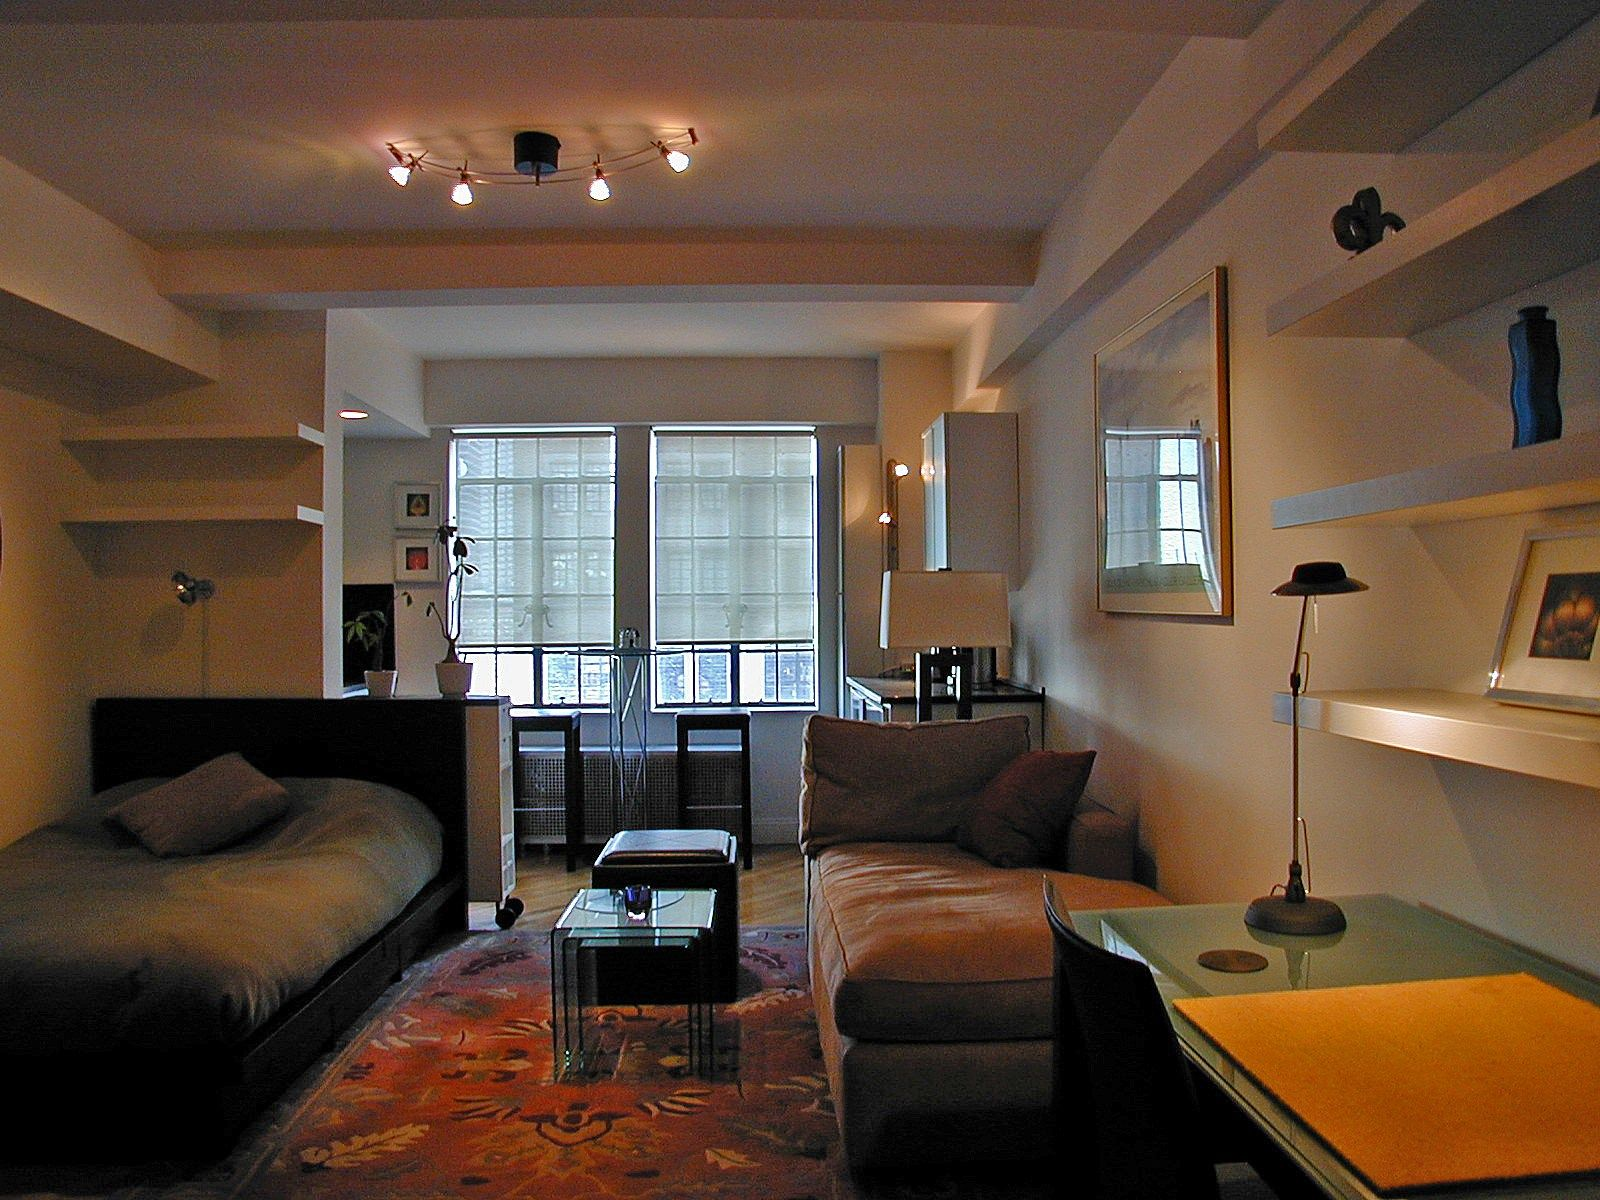 apartment design ideas modern home interior decorations small ...